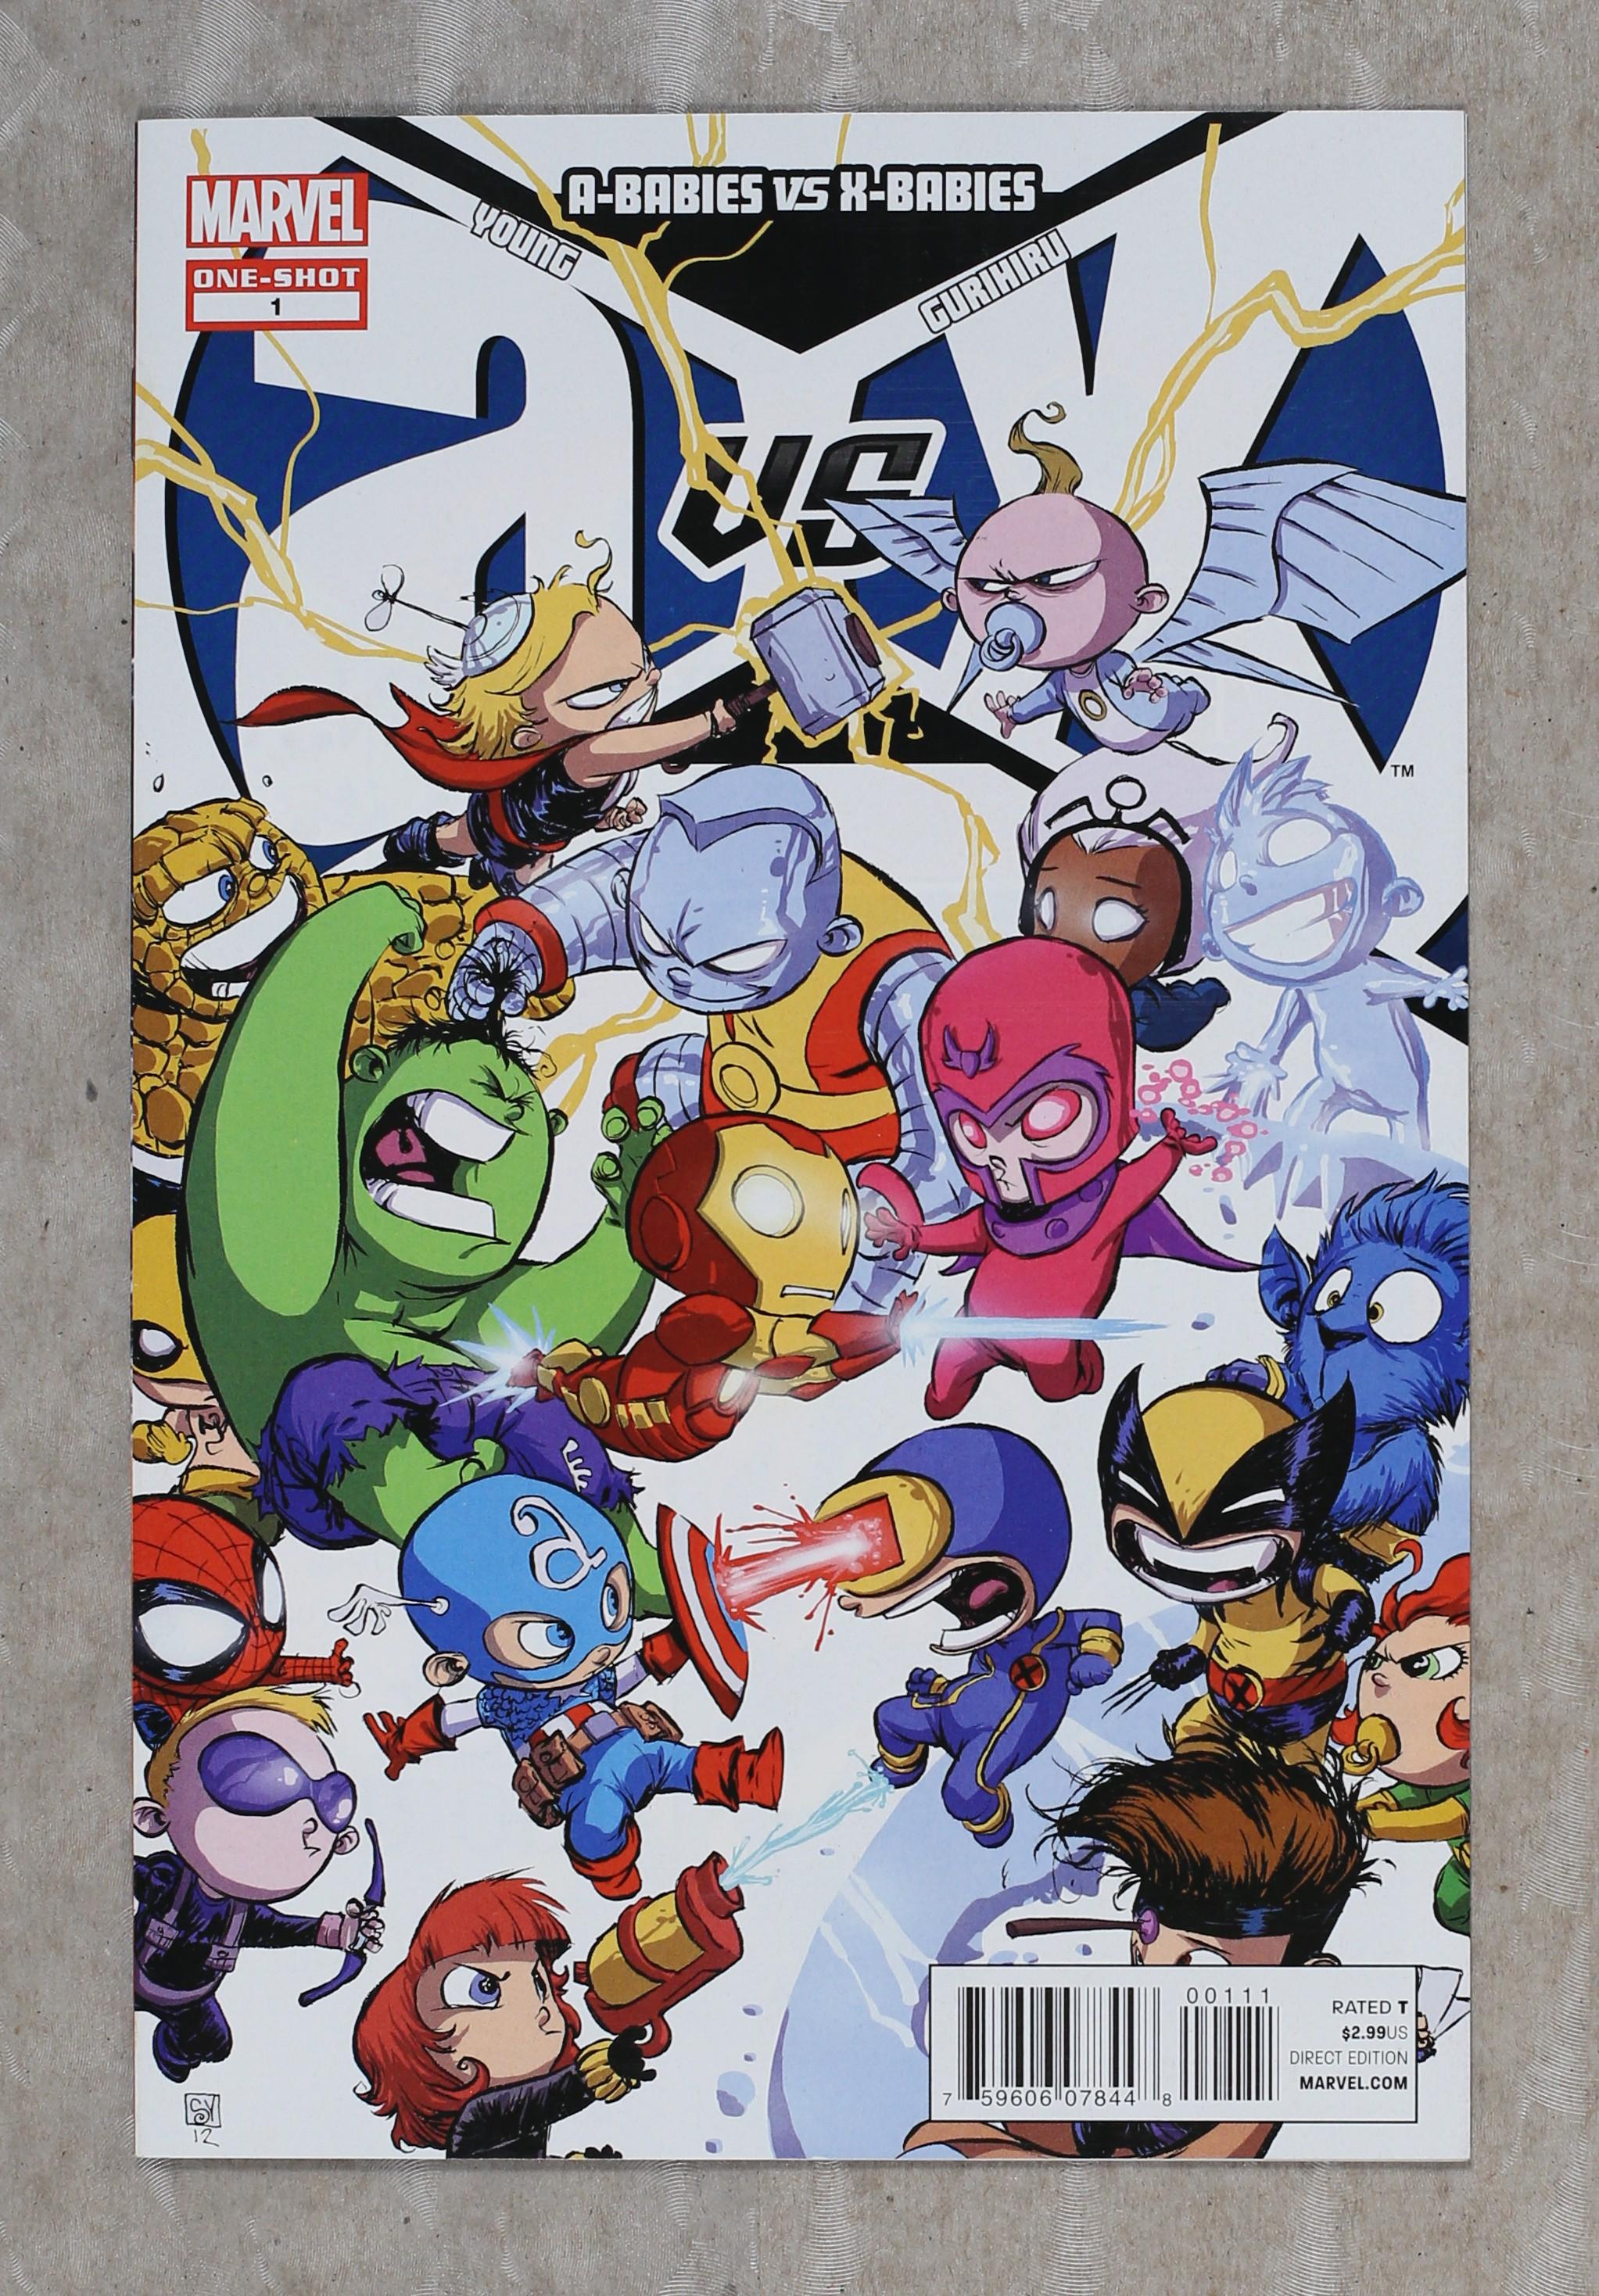 XBabies 2009 1  Comics  Marvelcom